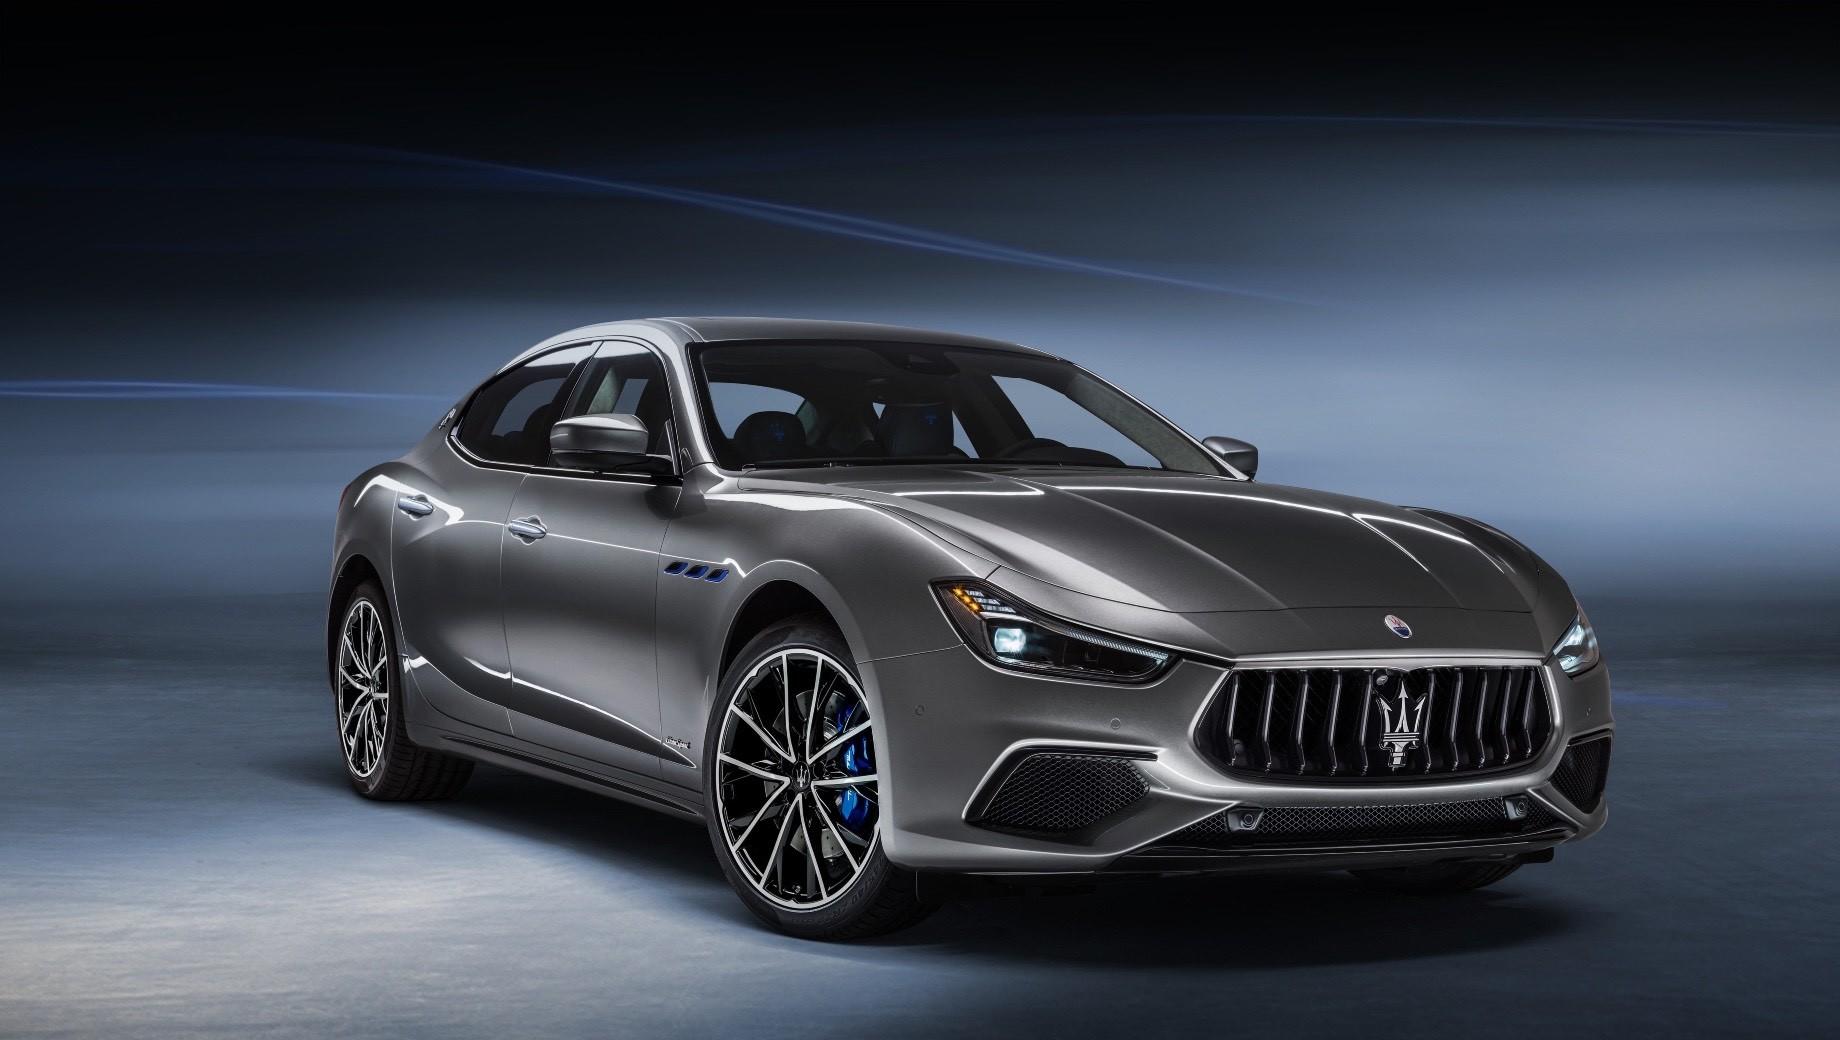 Maserati ghibli,Maserati ghibli hybrid. Снаружи гибридная модификация привлекает внимание синими элементами: окантовкой прорезей в передних крыльях, тормозными суппортами и молнией в логотипах на задних стойках. Цена на Ghibli Hybrid в Англии — от 58 220 фунтов (5,2 млн рублей). За Ghibli с дизелем просят 54 835 фунтов (4,9 млн).